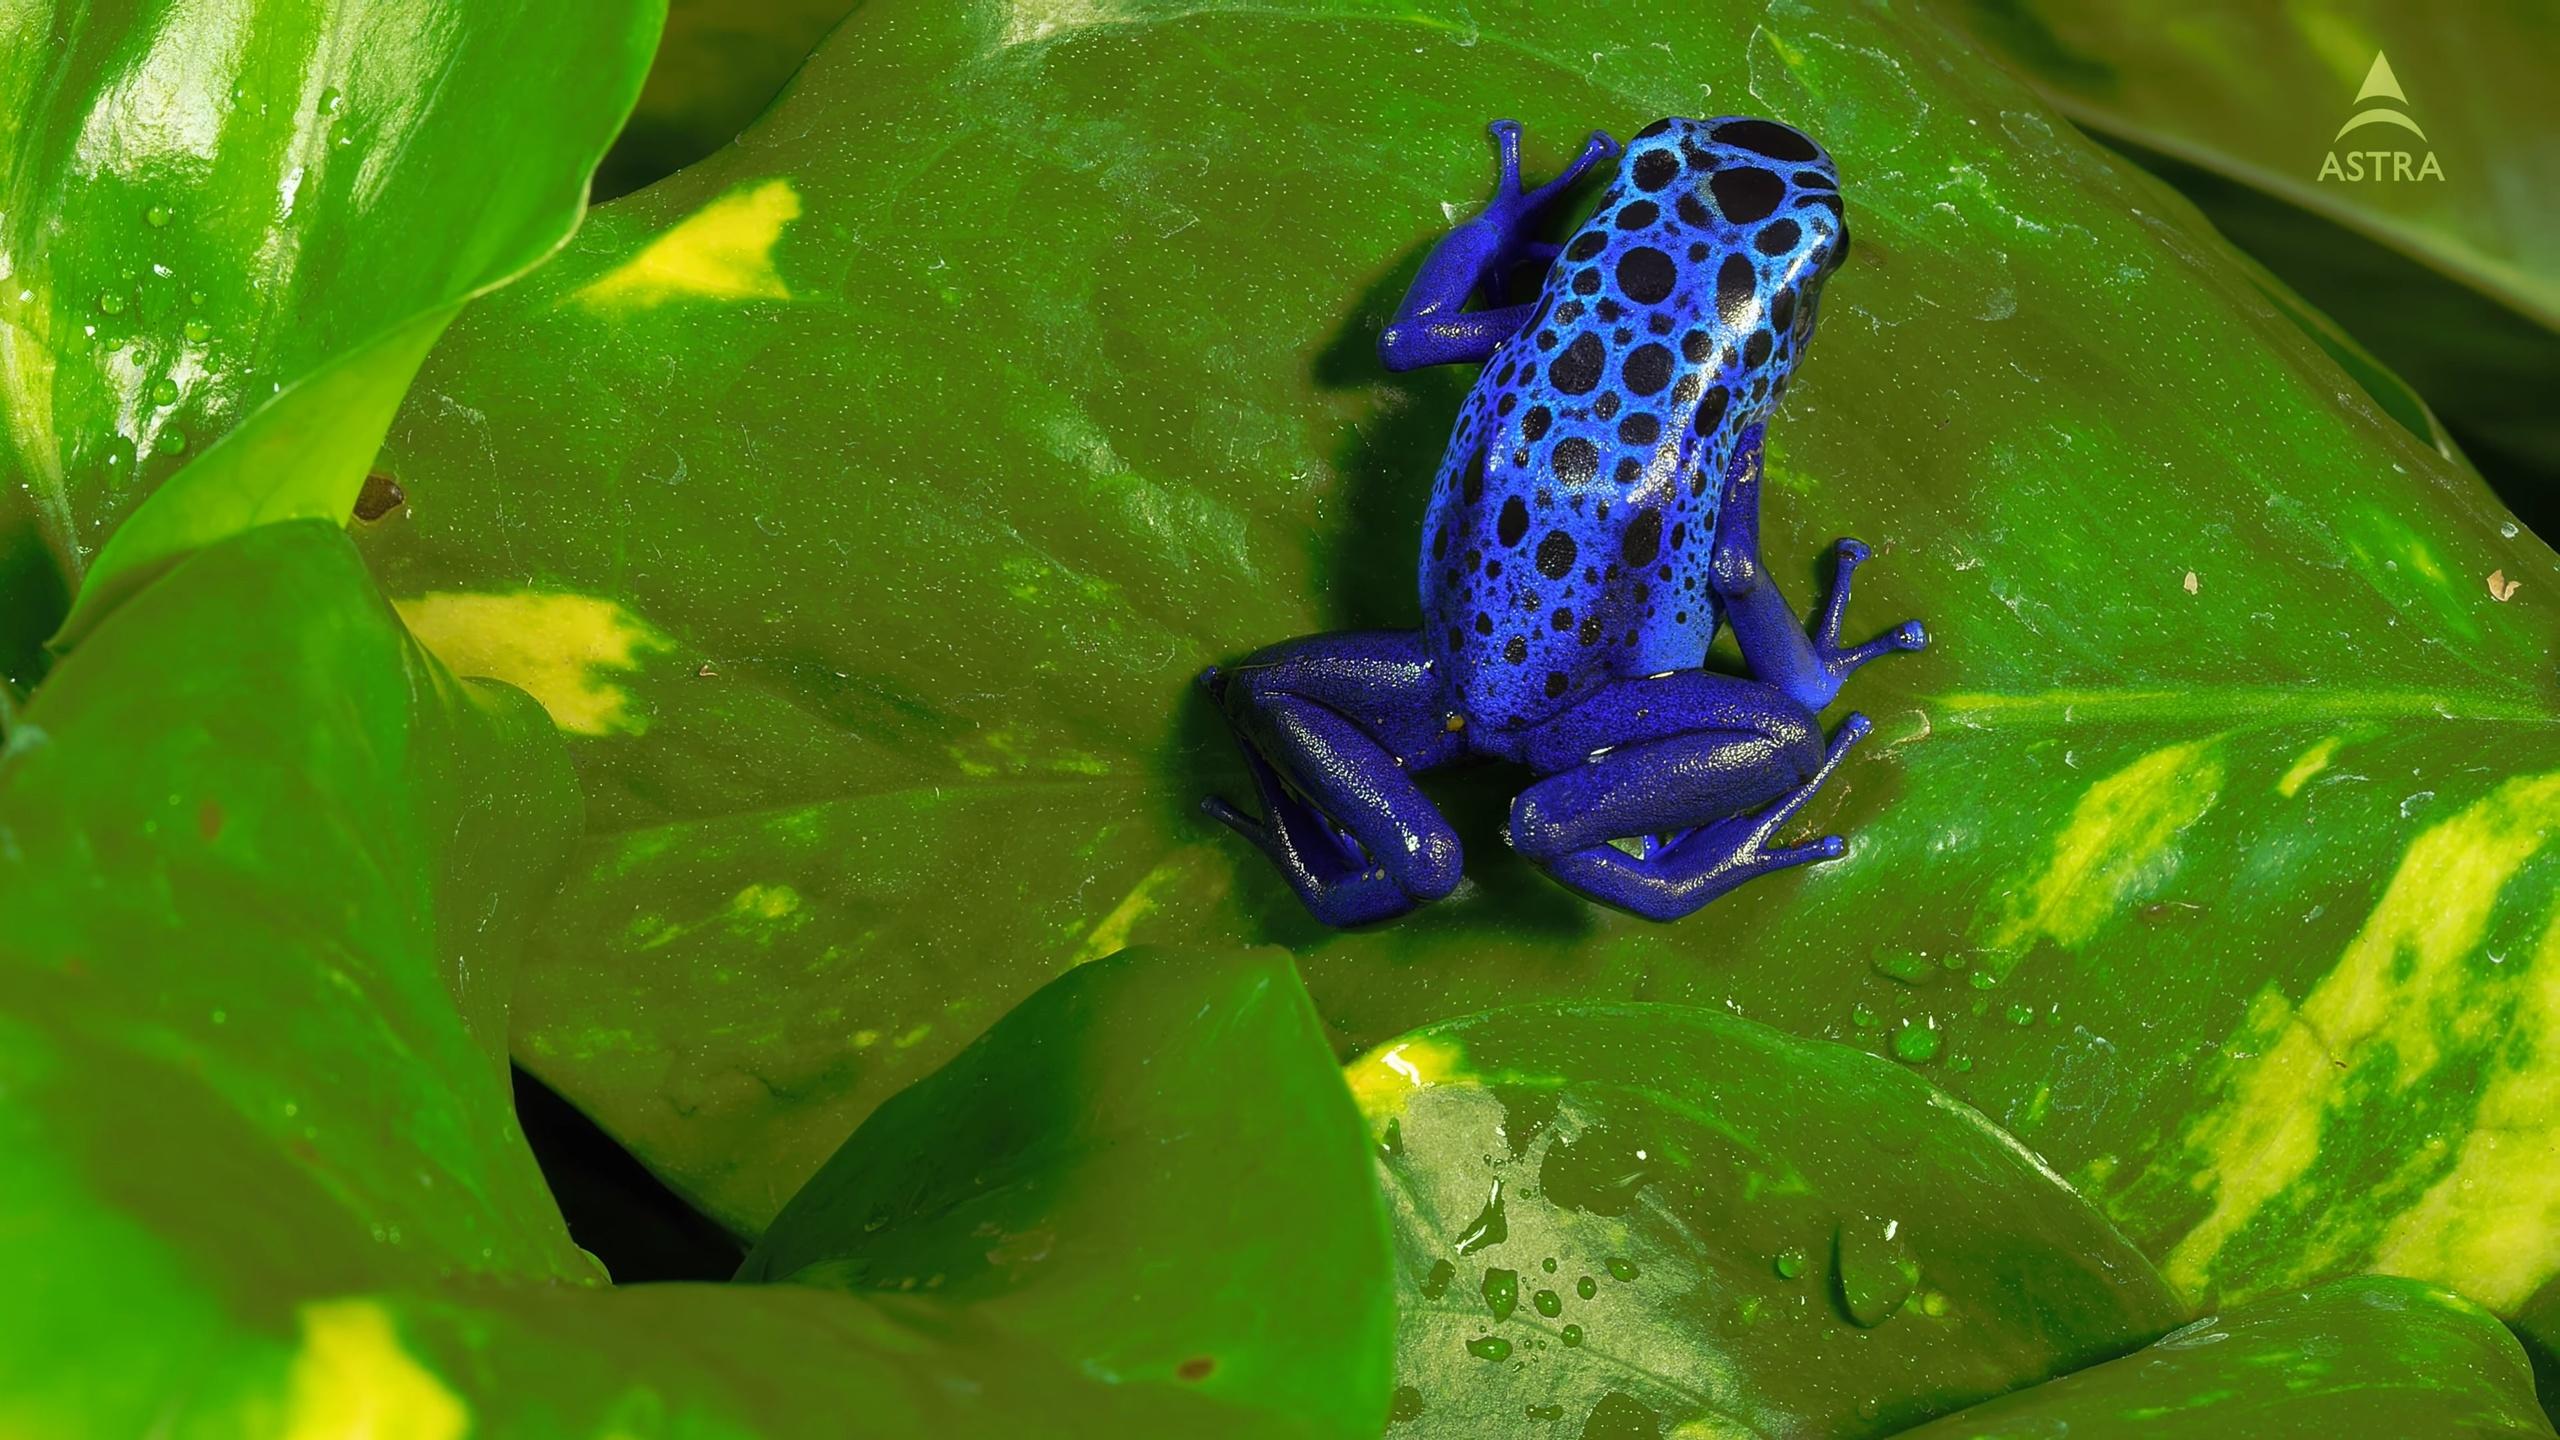 картинки голубых лягушек она задохнулась, так